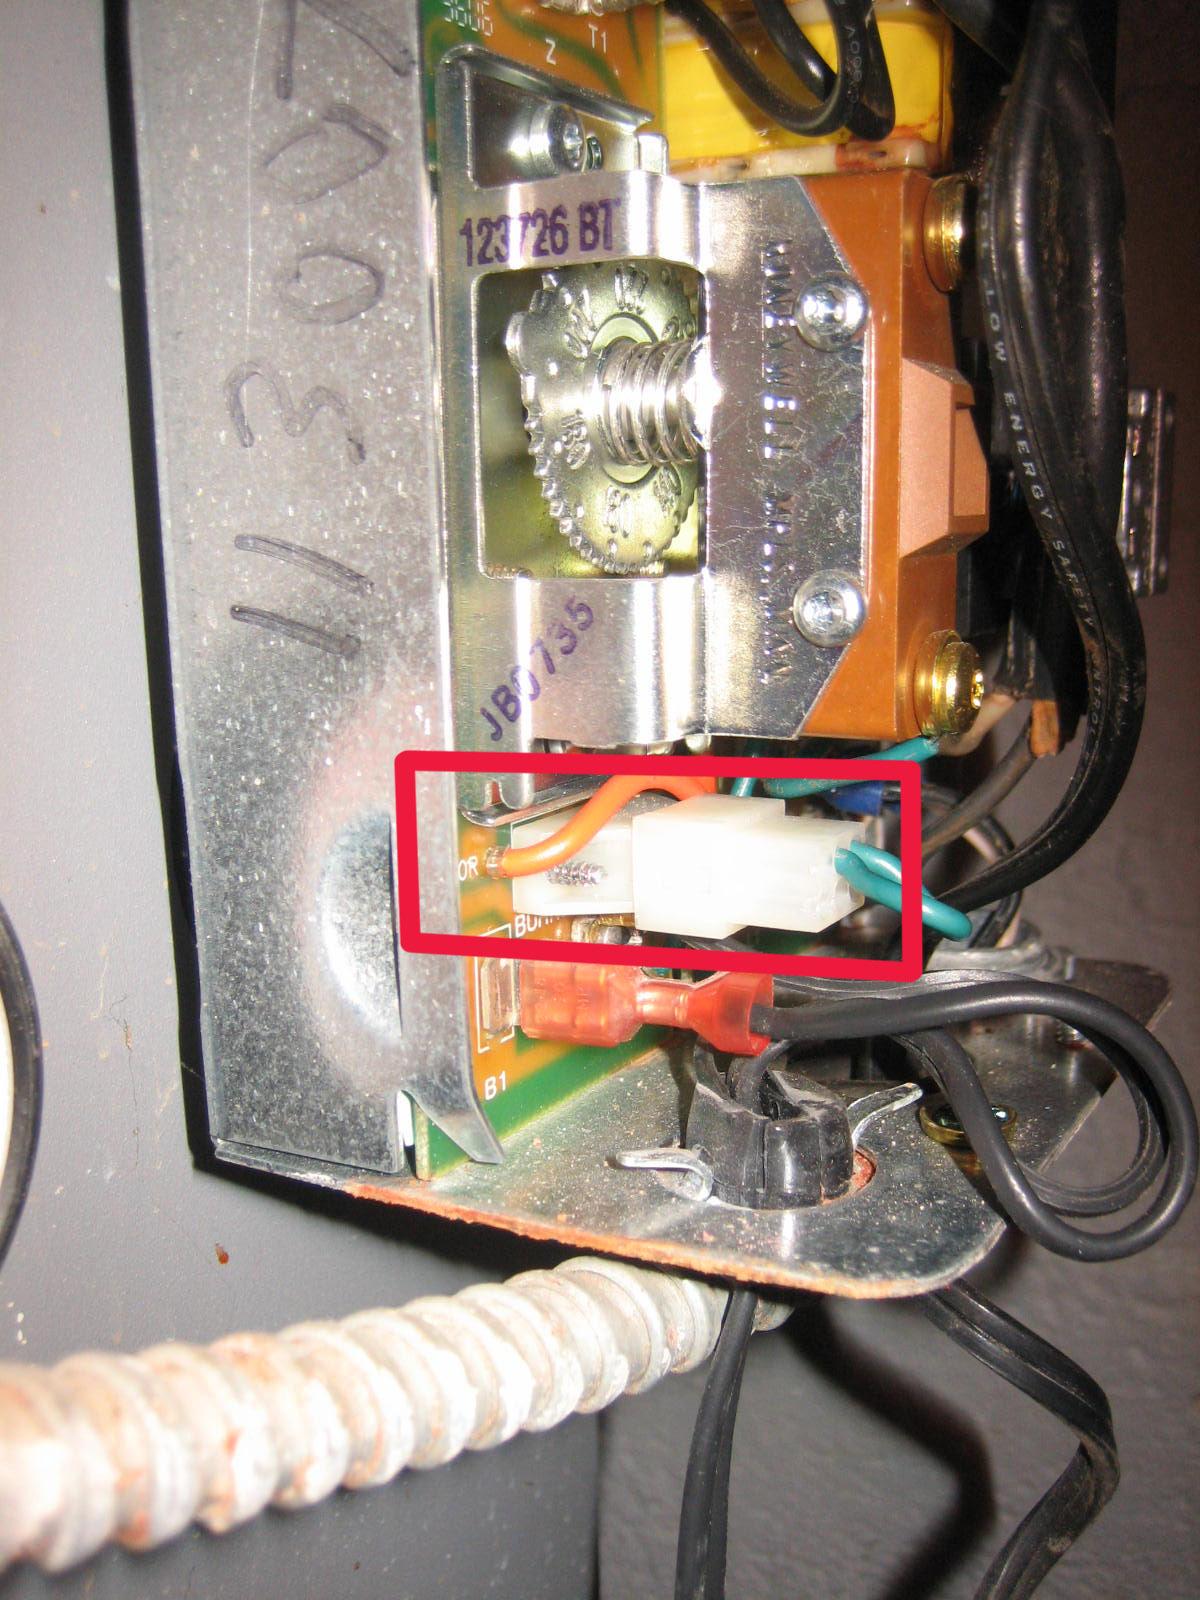 Honeywell Aquastat Relay L8148E Wiring | Wiring Diagram - Honeywell Aquastat L8148E Wiring Diagram